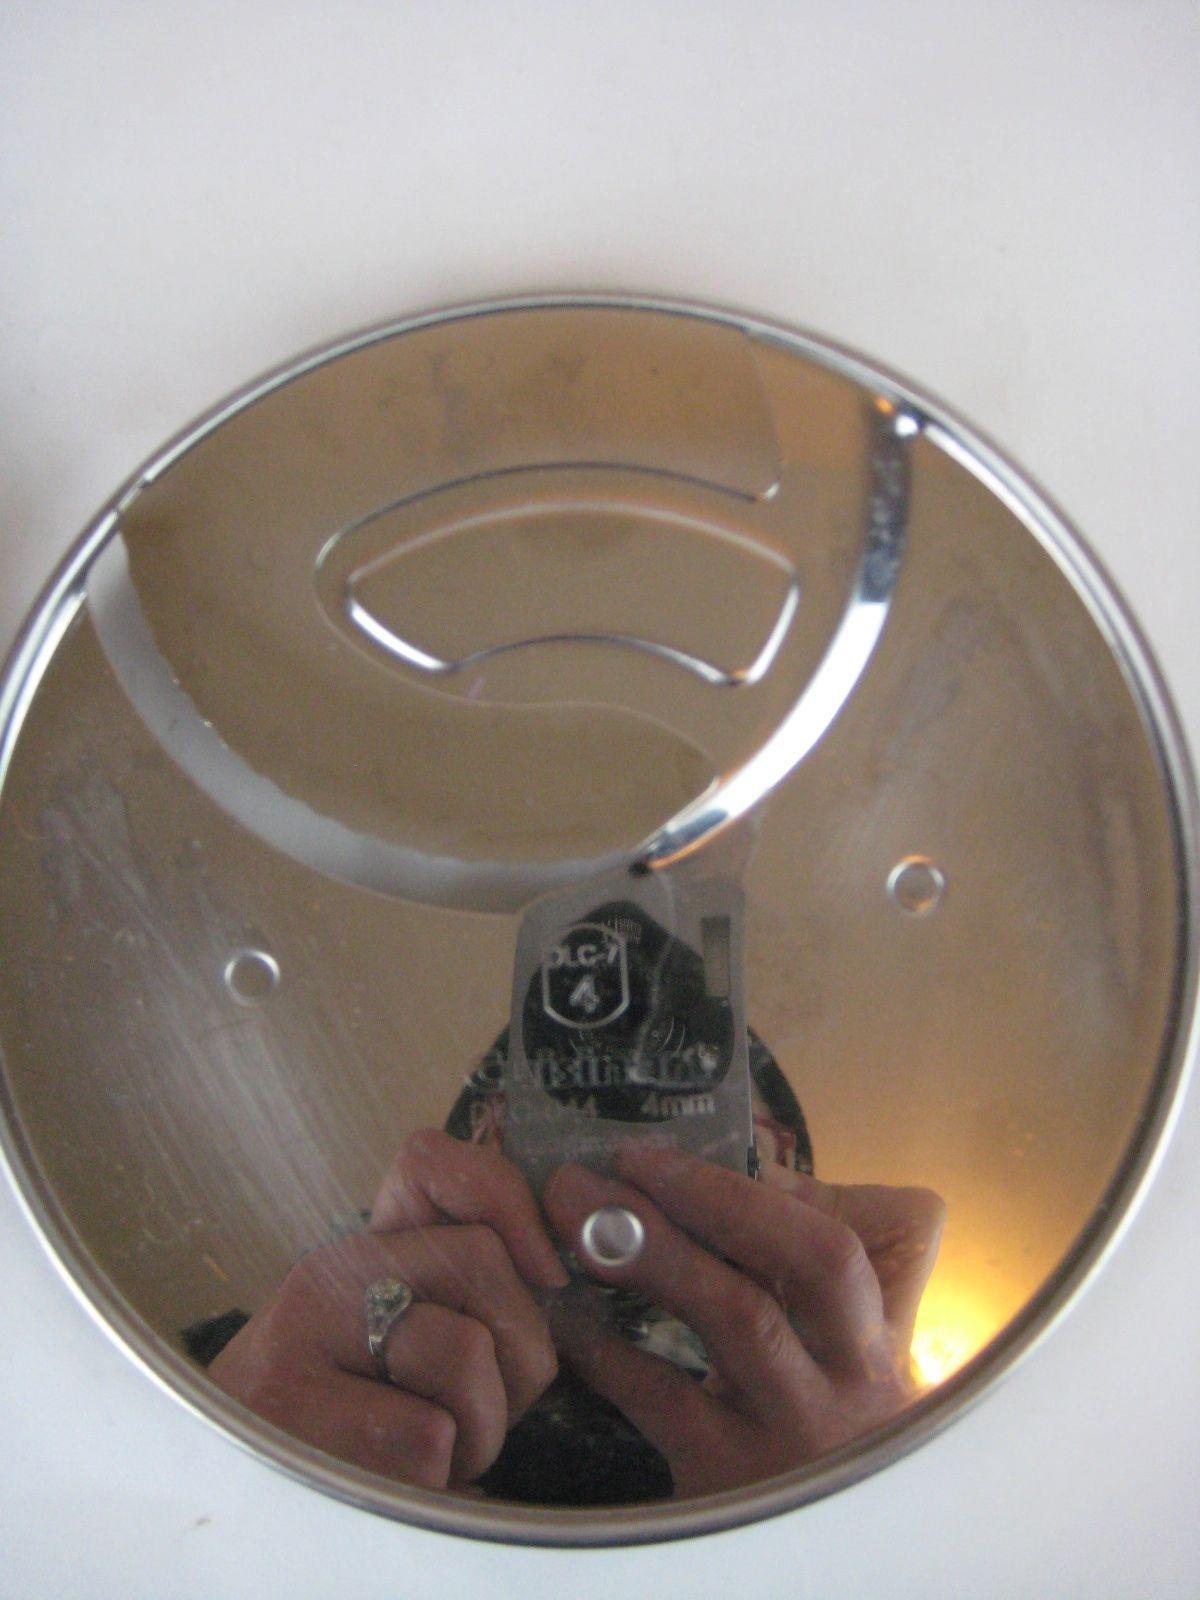 4mm Standard Slicing Disc Cuisinart Food Processor Dlc 044